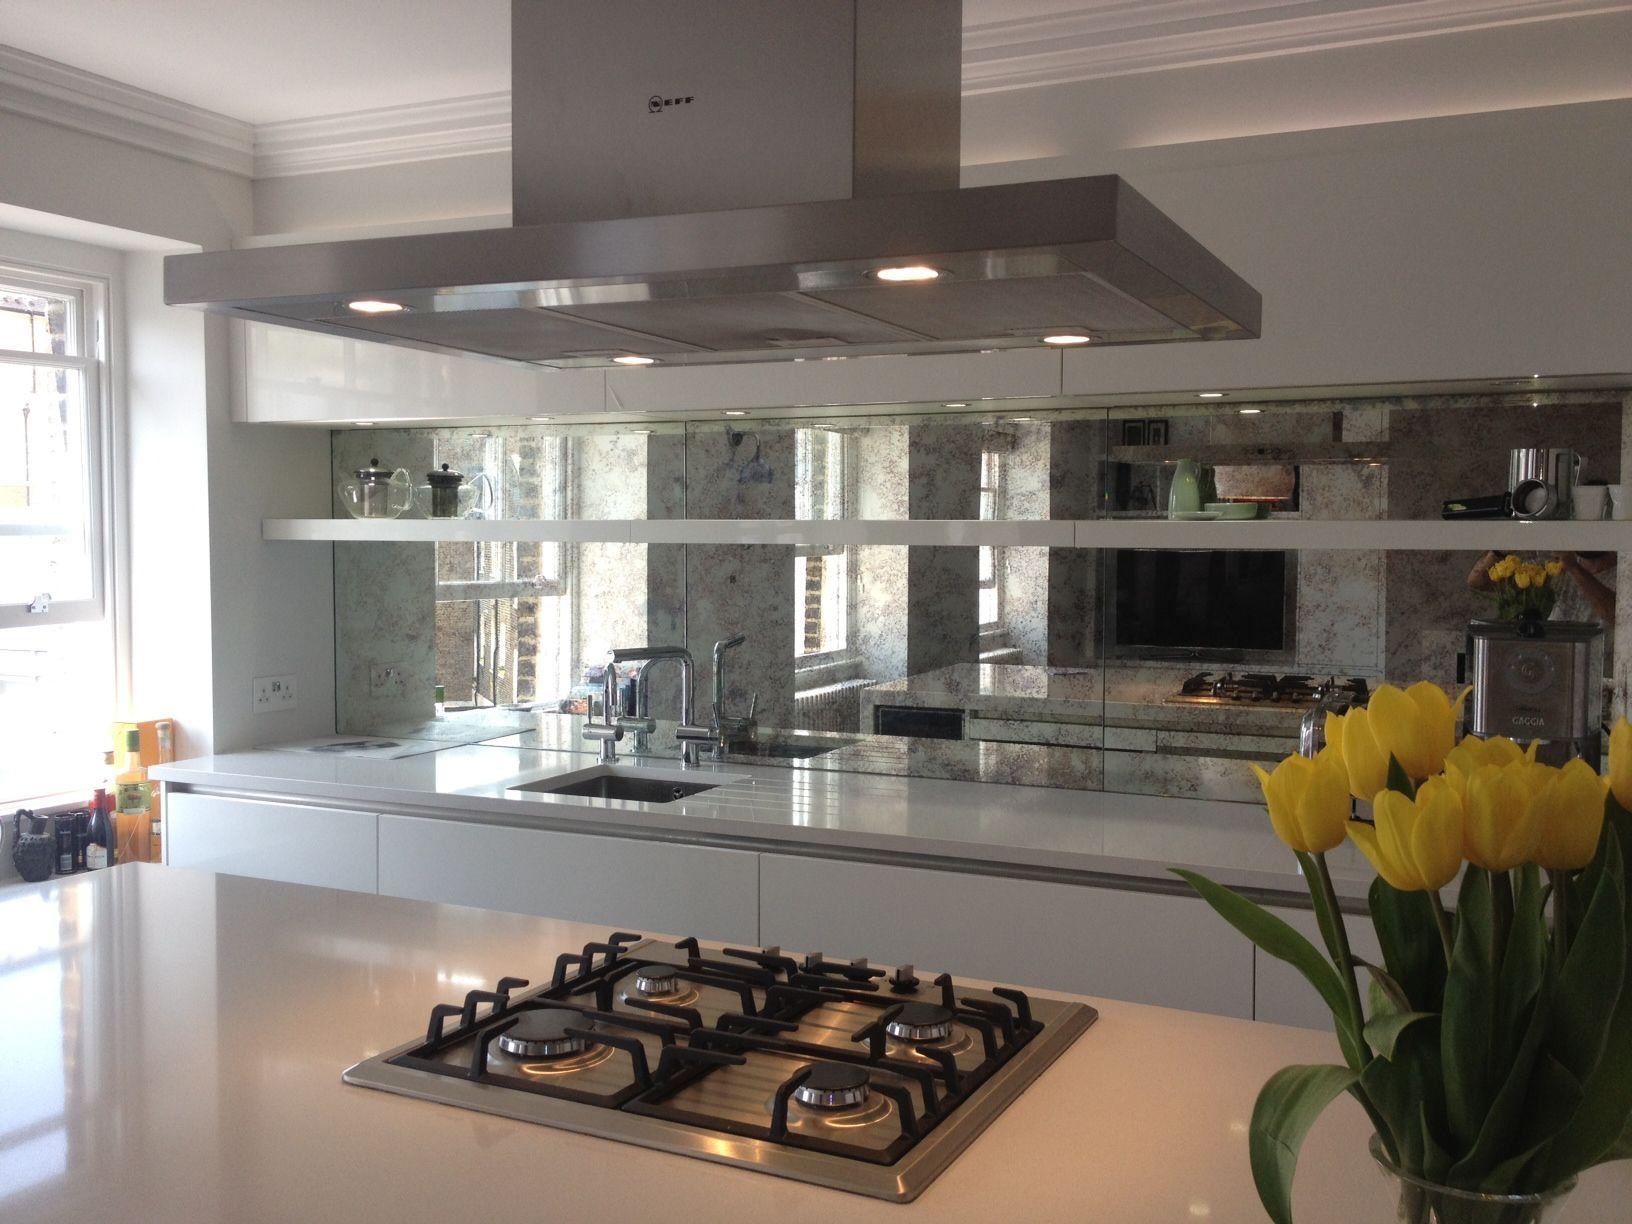 Kitchen Tiles And Splashbacks kitchen-mirror-splashback - acrylic mirror tiles | mirrors